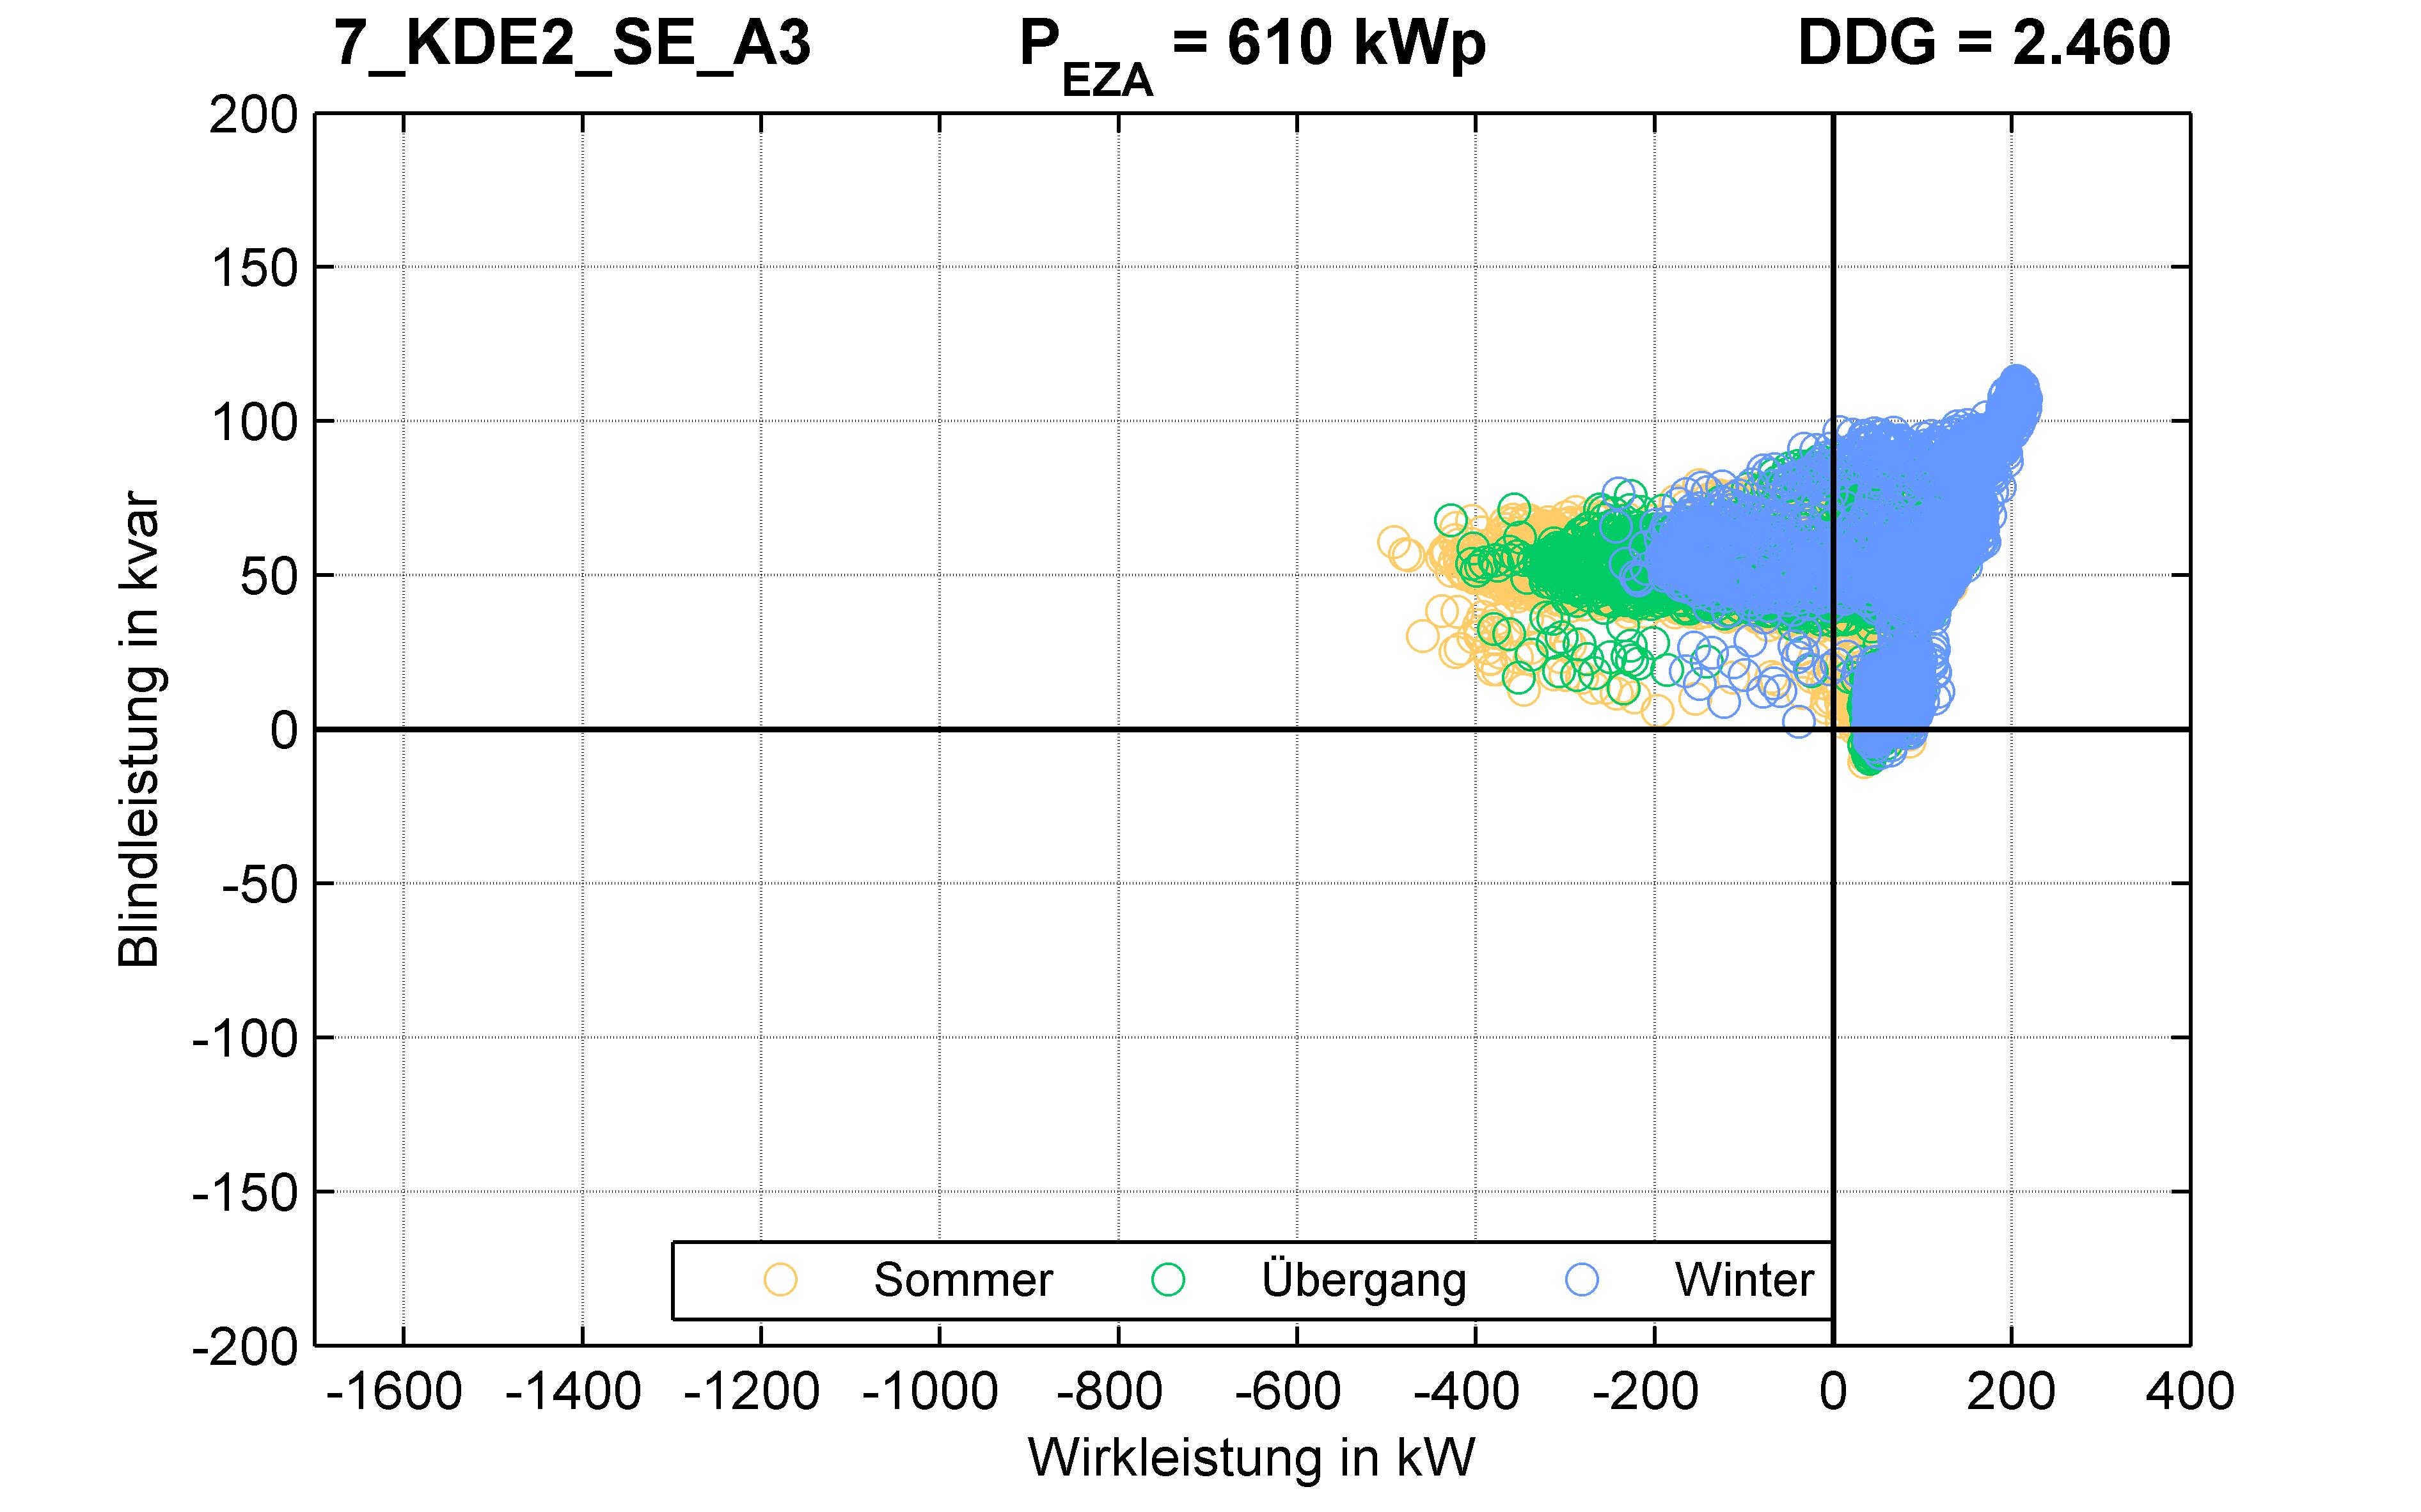 KDE2 | Längsregler (SE) A3 | PQ-Verhalten